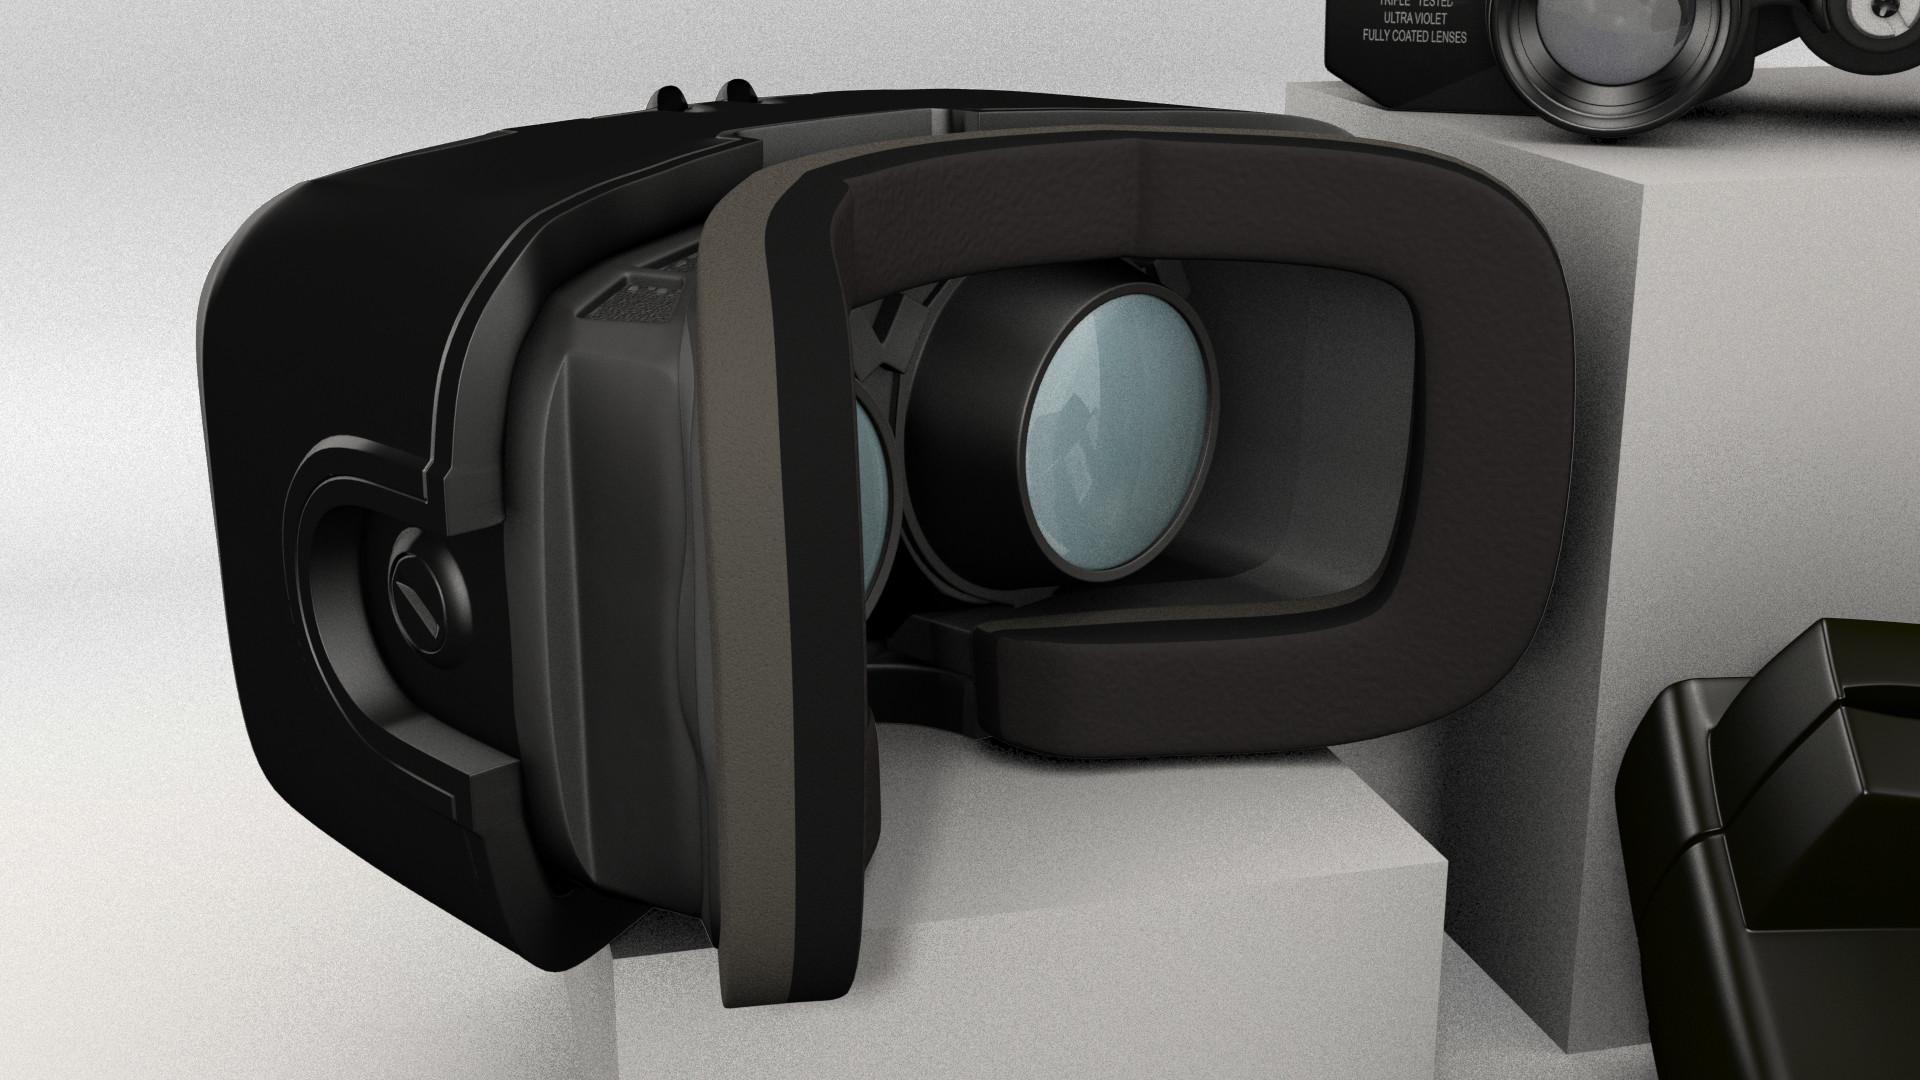 Emile van den berghe oculus render 01